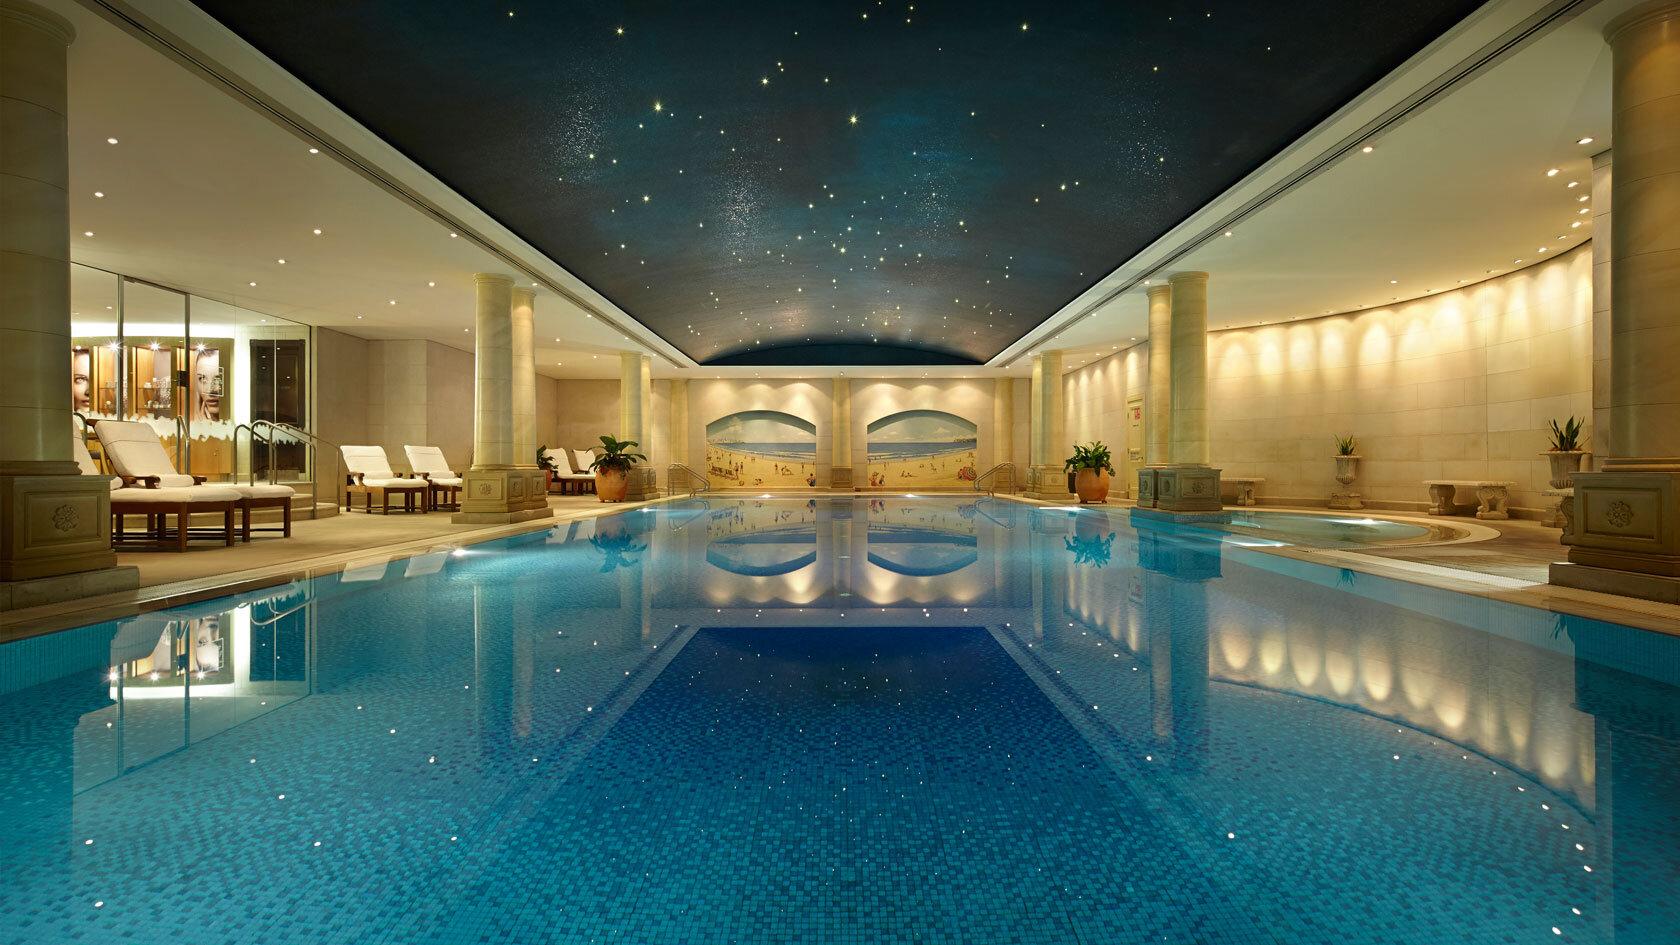 tlsyd-wellness-swimming-pool-1680-945.jpg